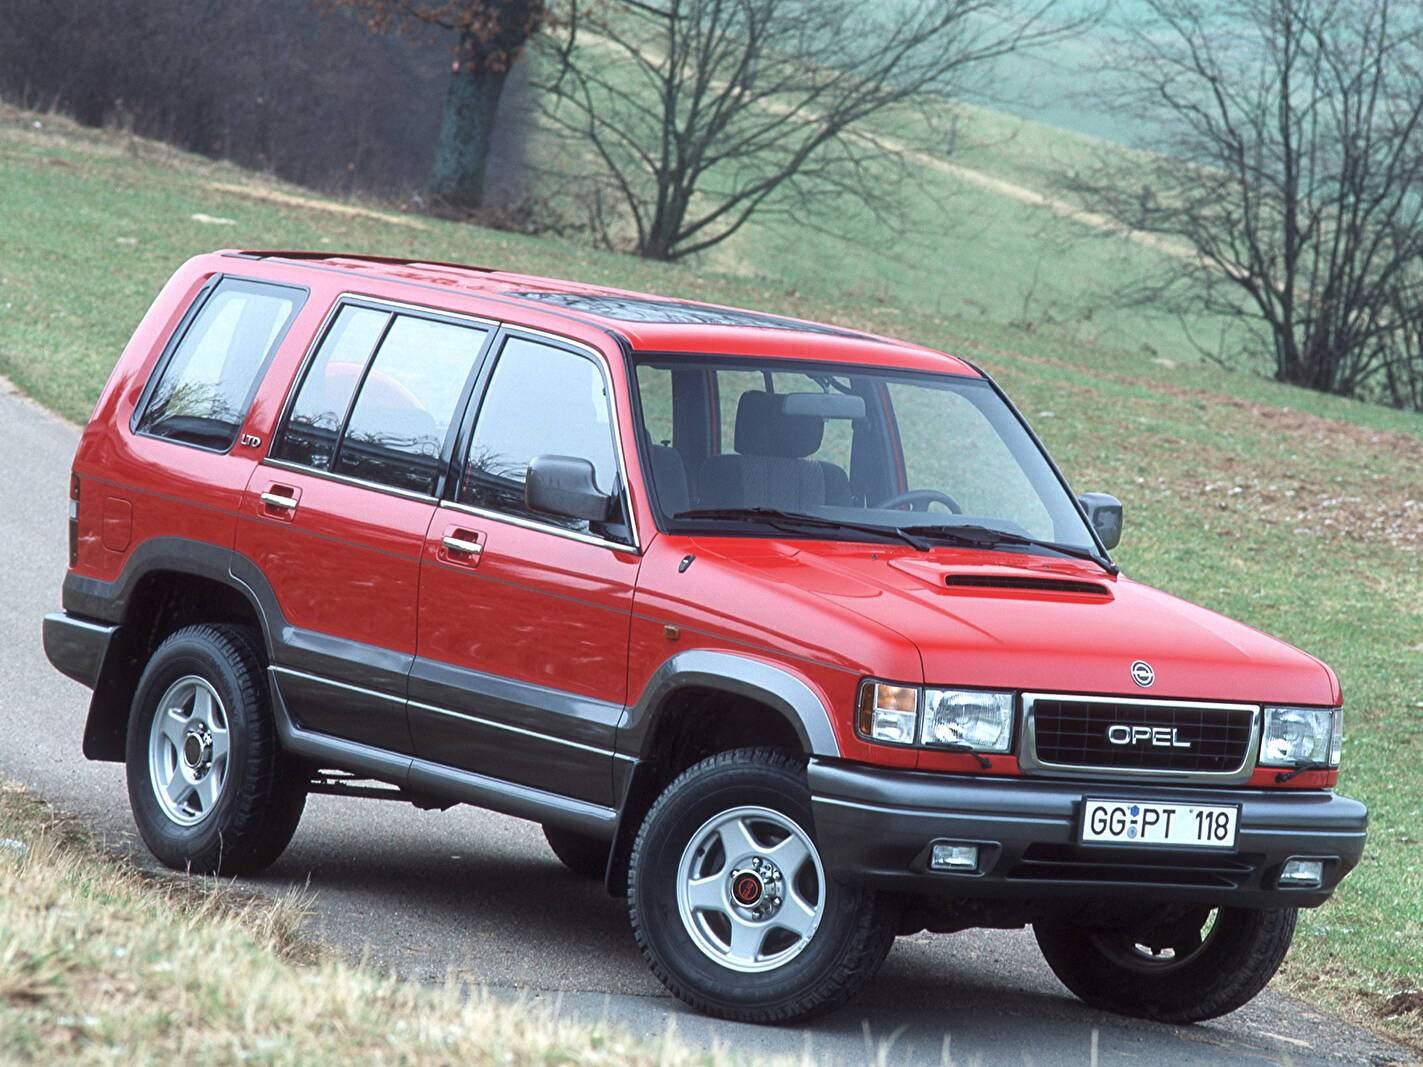 Opel Monterey 3.1 TDI 115 (1992-1998),  ajouté par fox58